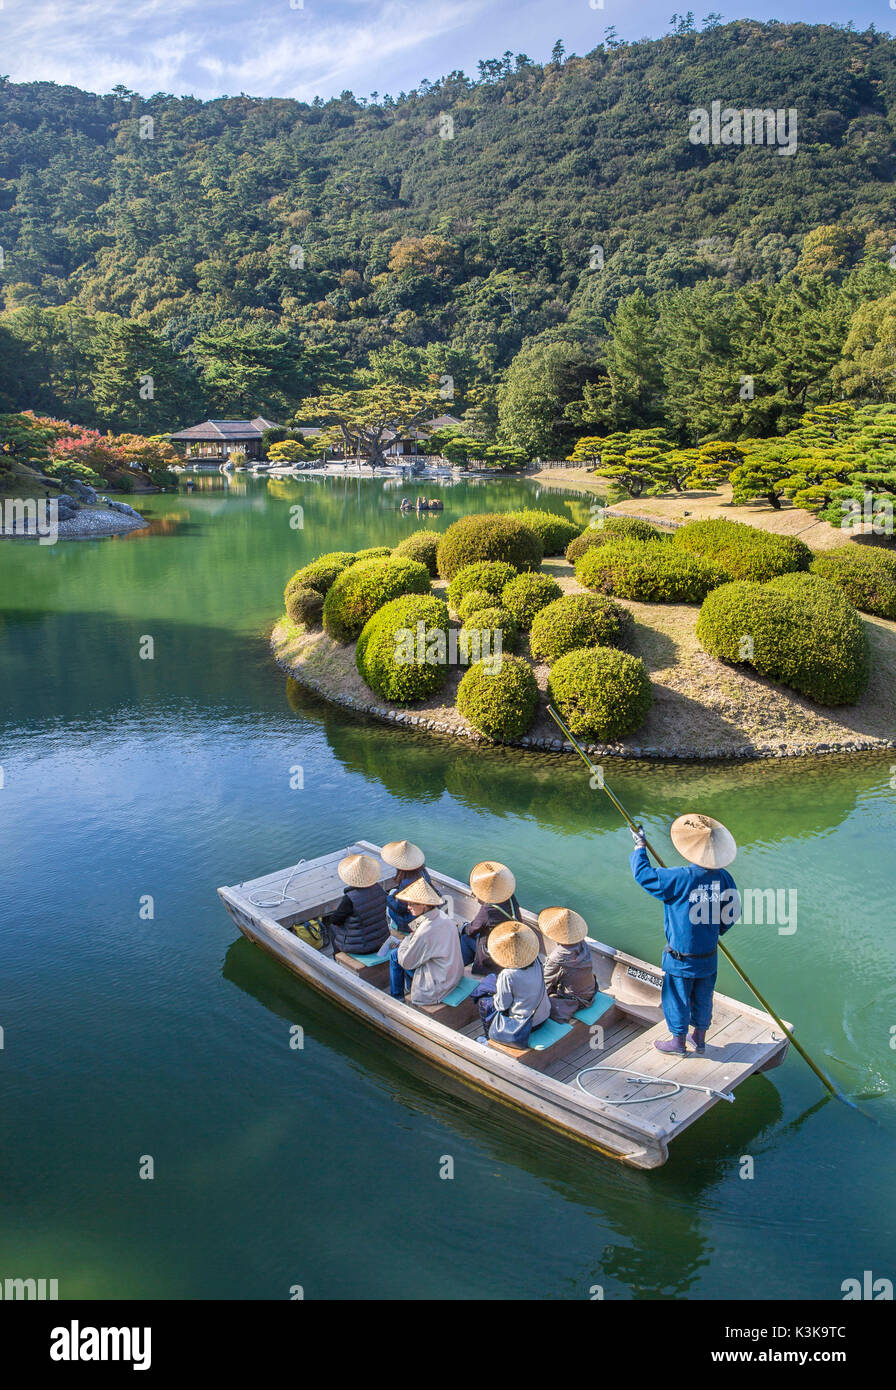 Le Japon, l'île de Shikoku, Takamatsu Ritsurin Koen, ville jardin, bateau, transport, tourisme Photo Stock